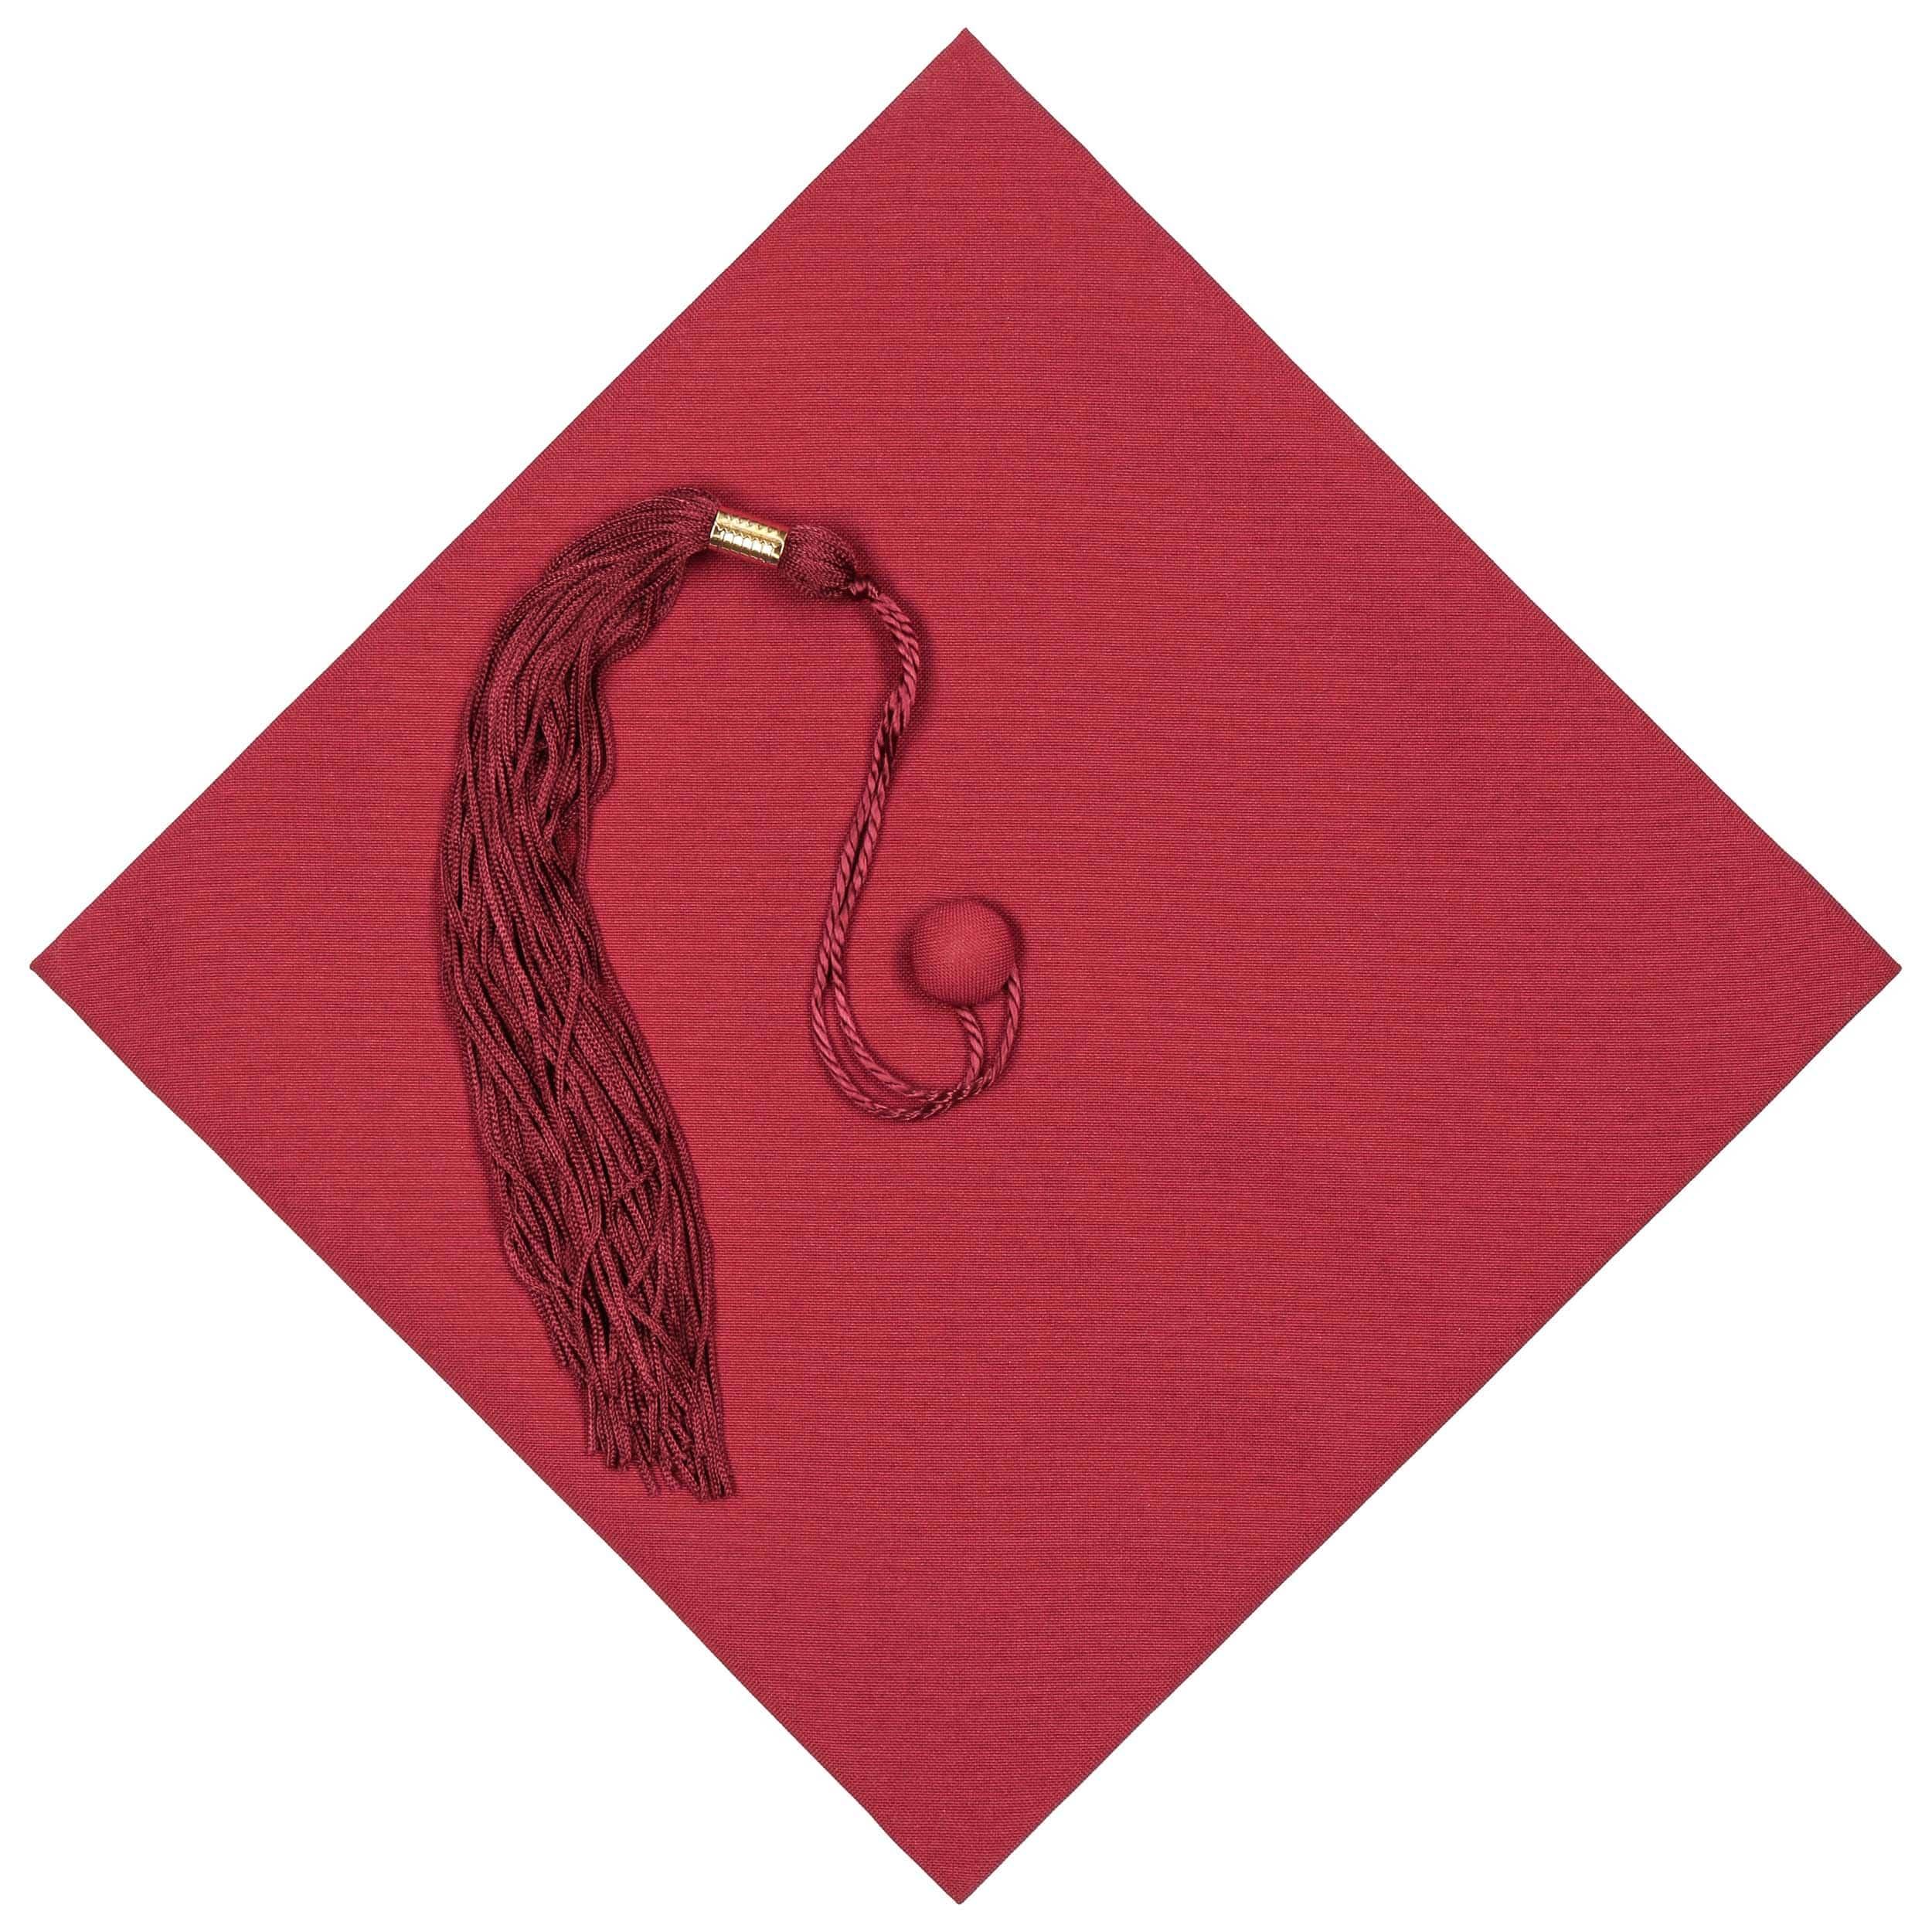 ... Cappello da Laurea Flessibile by Lierys - rosso bordeaux 1 ... f9d69fef163f